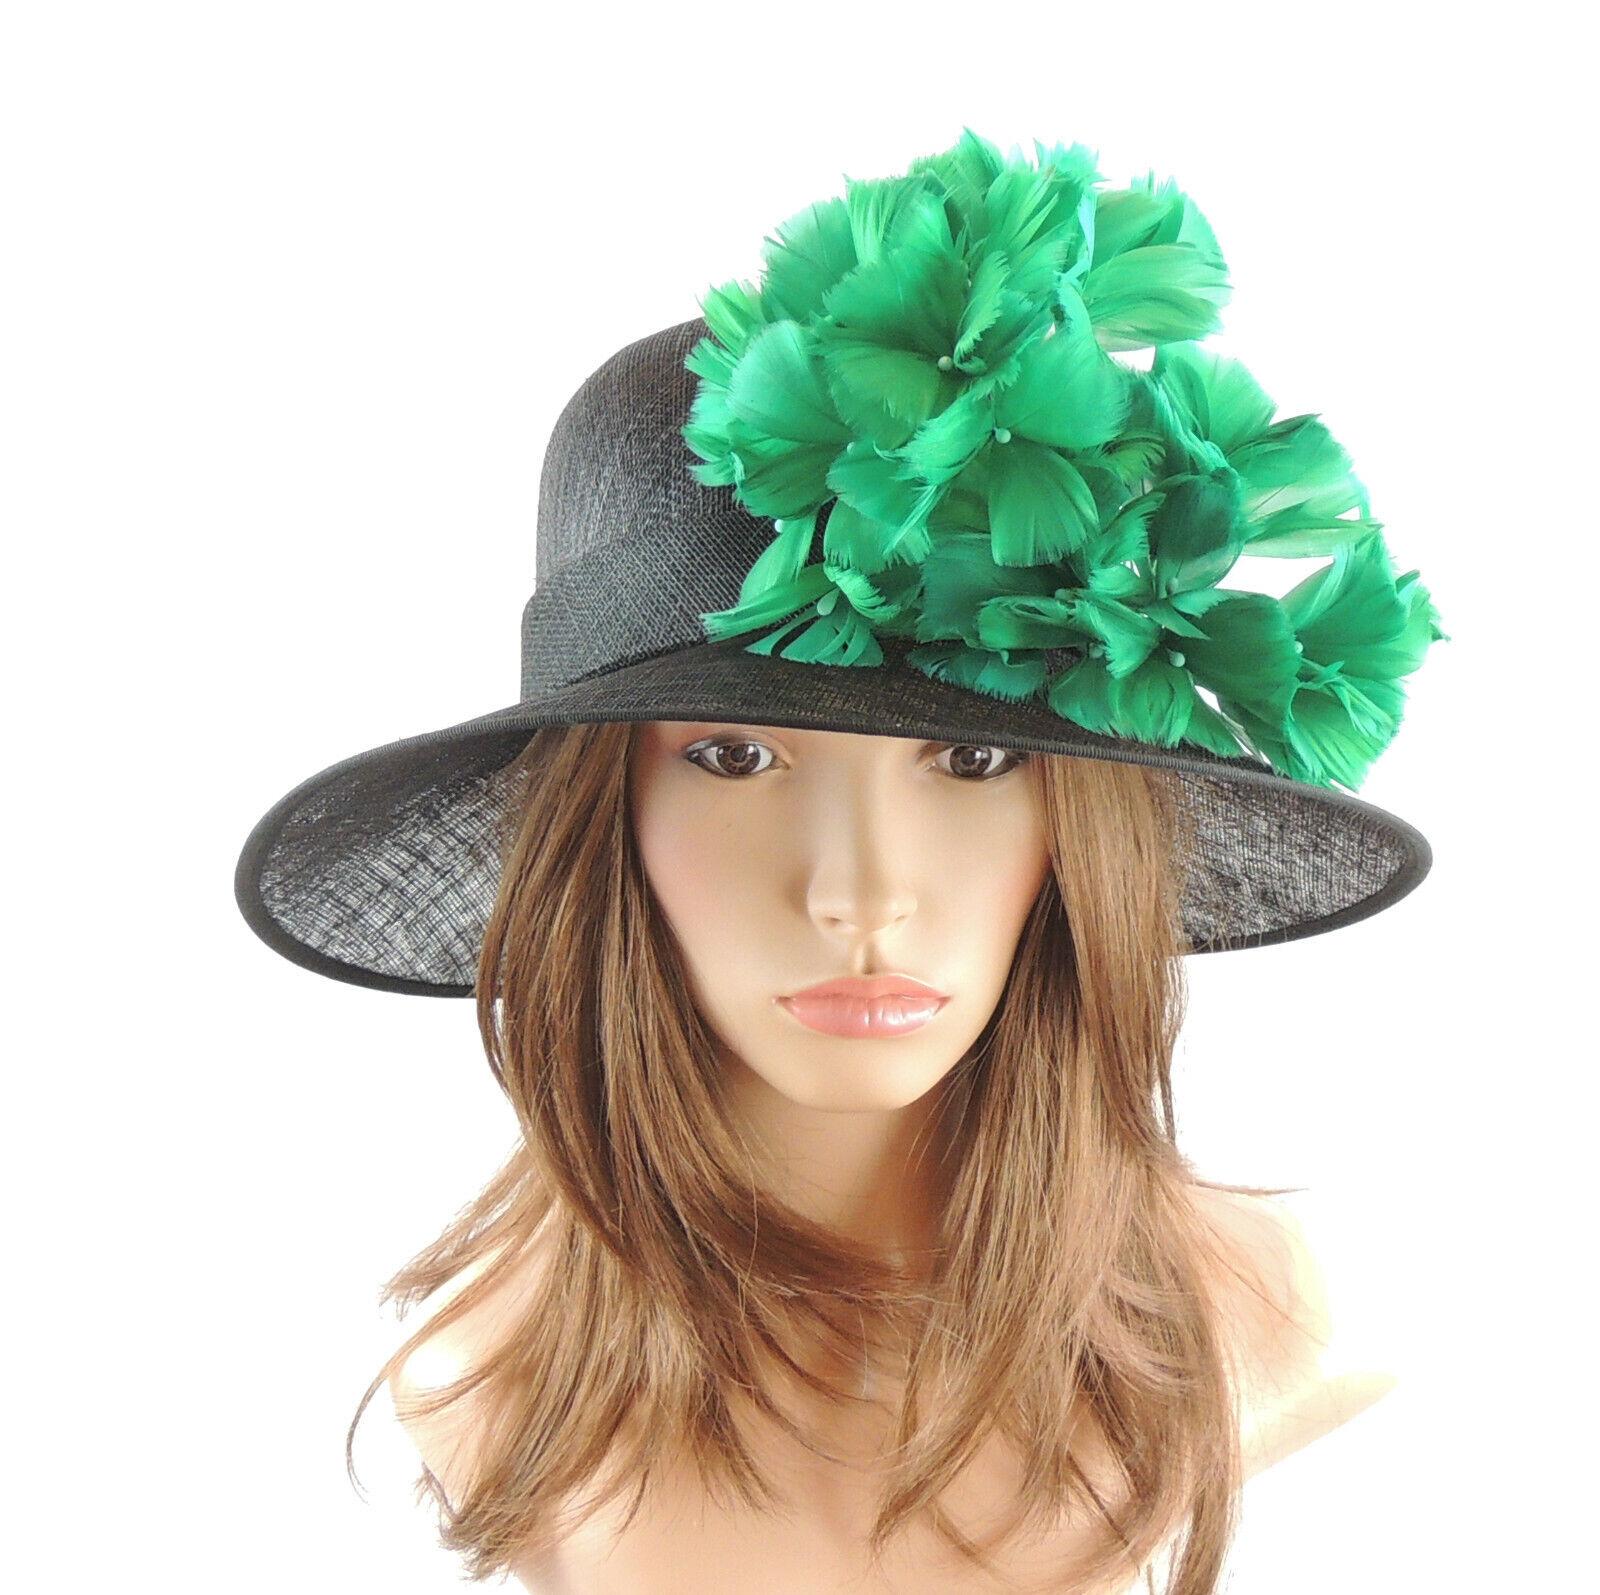 Black & Jade Green Ascot Hat for Weddings, Ascot, Melbourne Cup HA